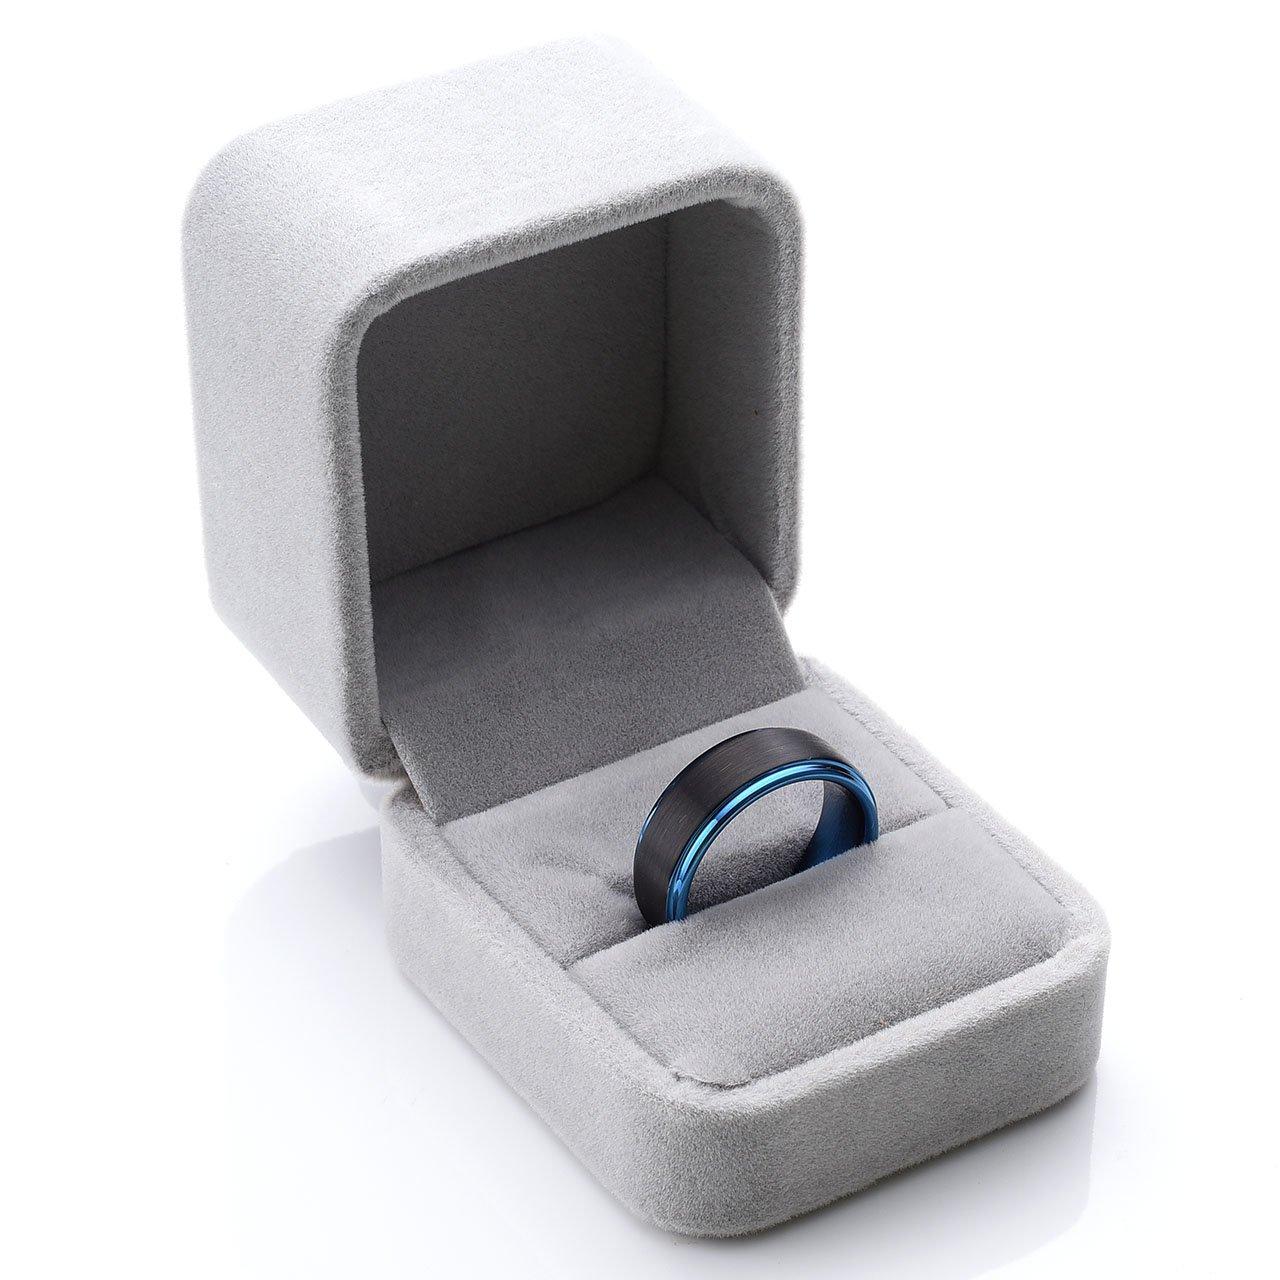 Zysta Polished Blue Matte Black Two Tone Polished Elegant Tungsten Carbide Ring 8mm Men Wedding Engagement Size 10